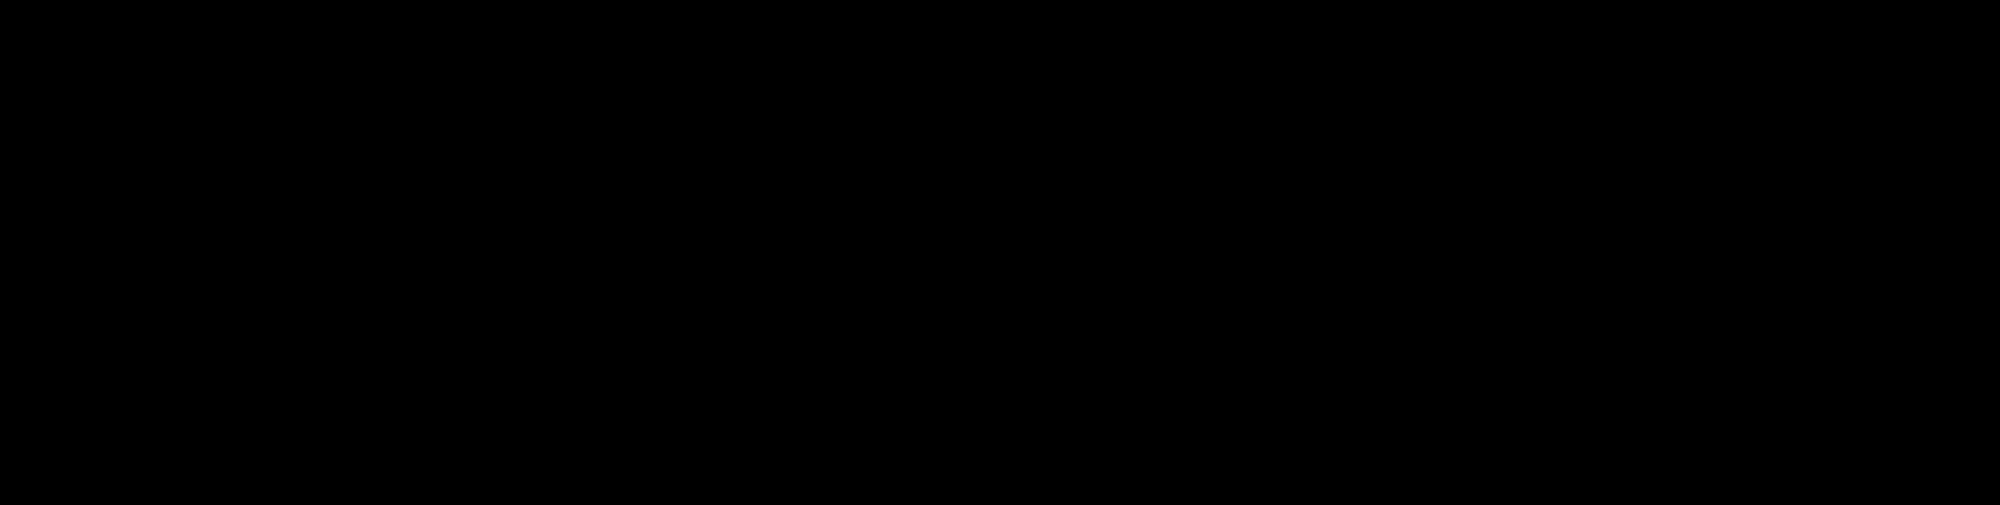 2000x505 Filetruss Bridge Icon.svg